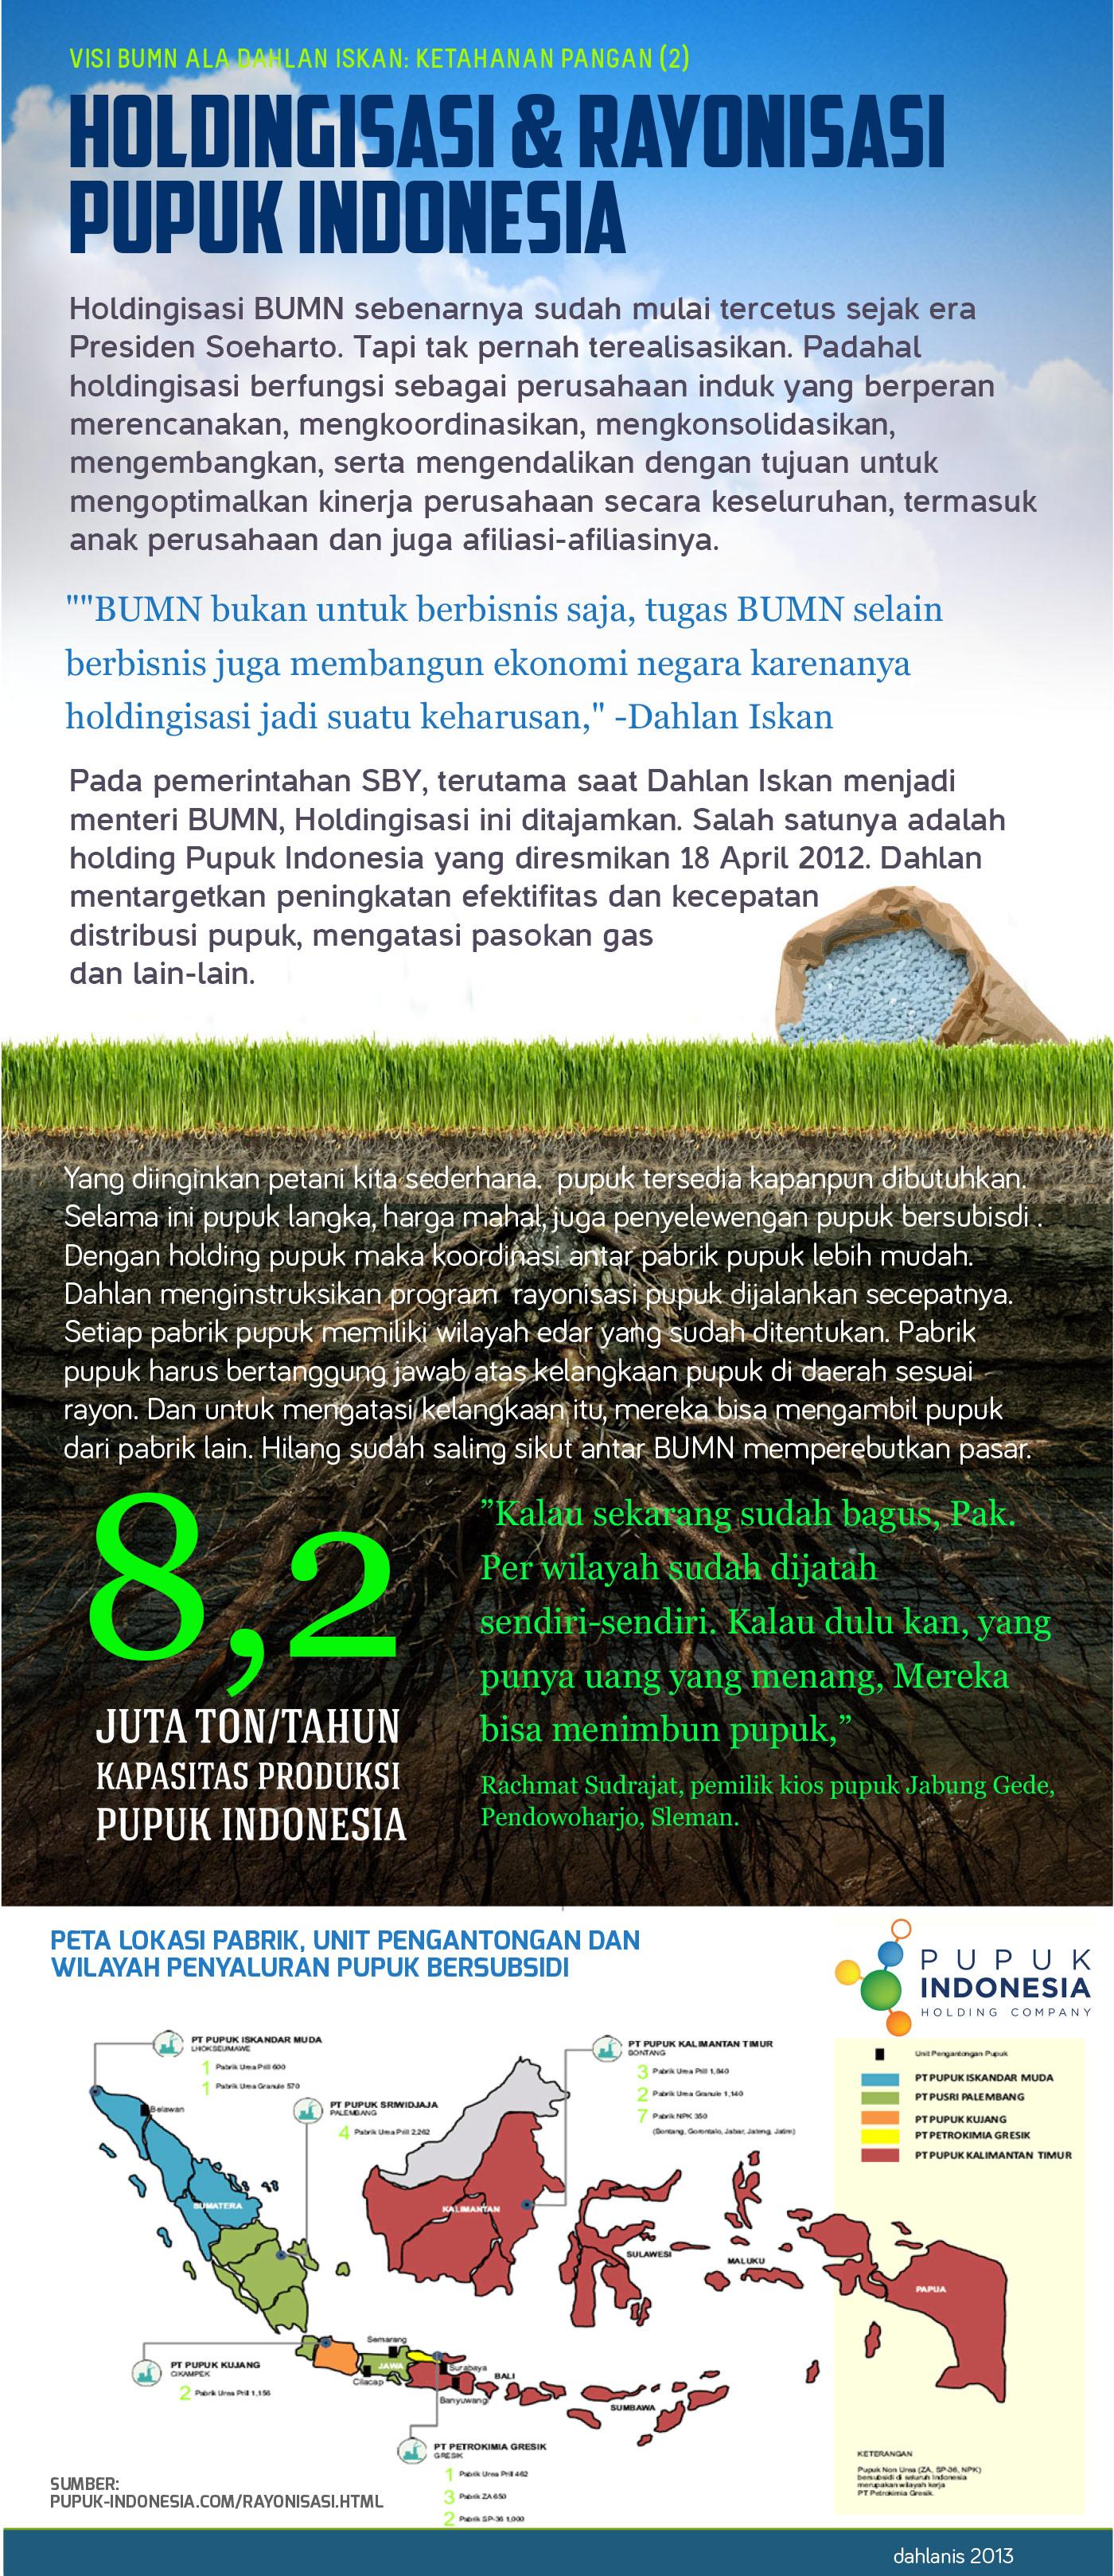 07 Dahlan Iskan - Holdingisasi & Rayonisasi Pupuk Indonesia